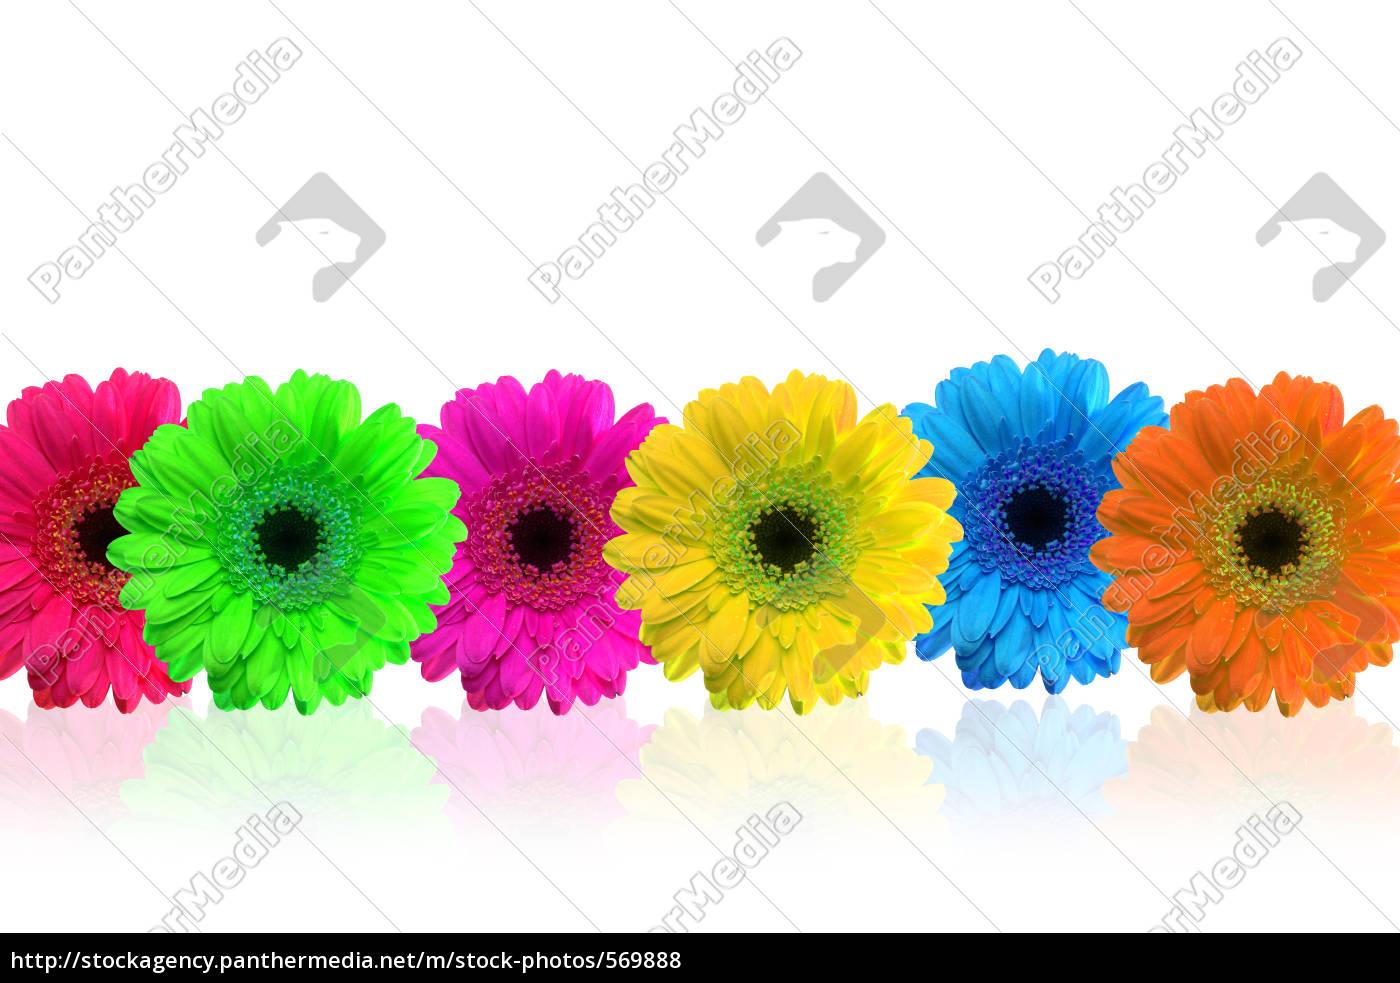 flowers - 569888